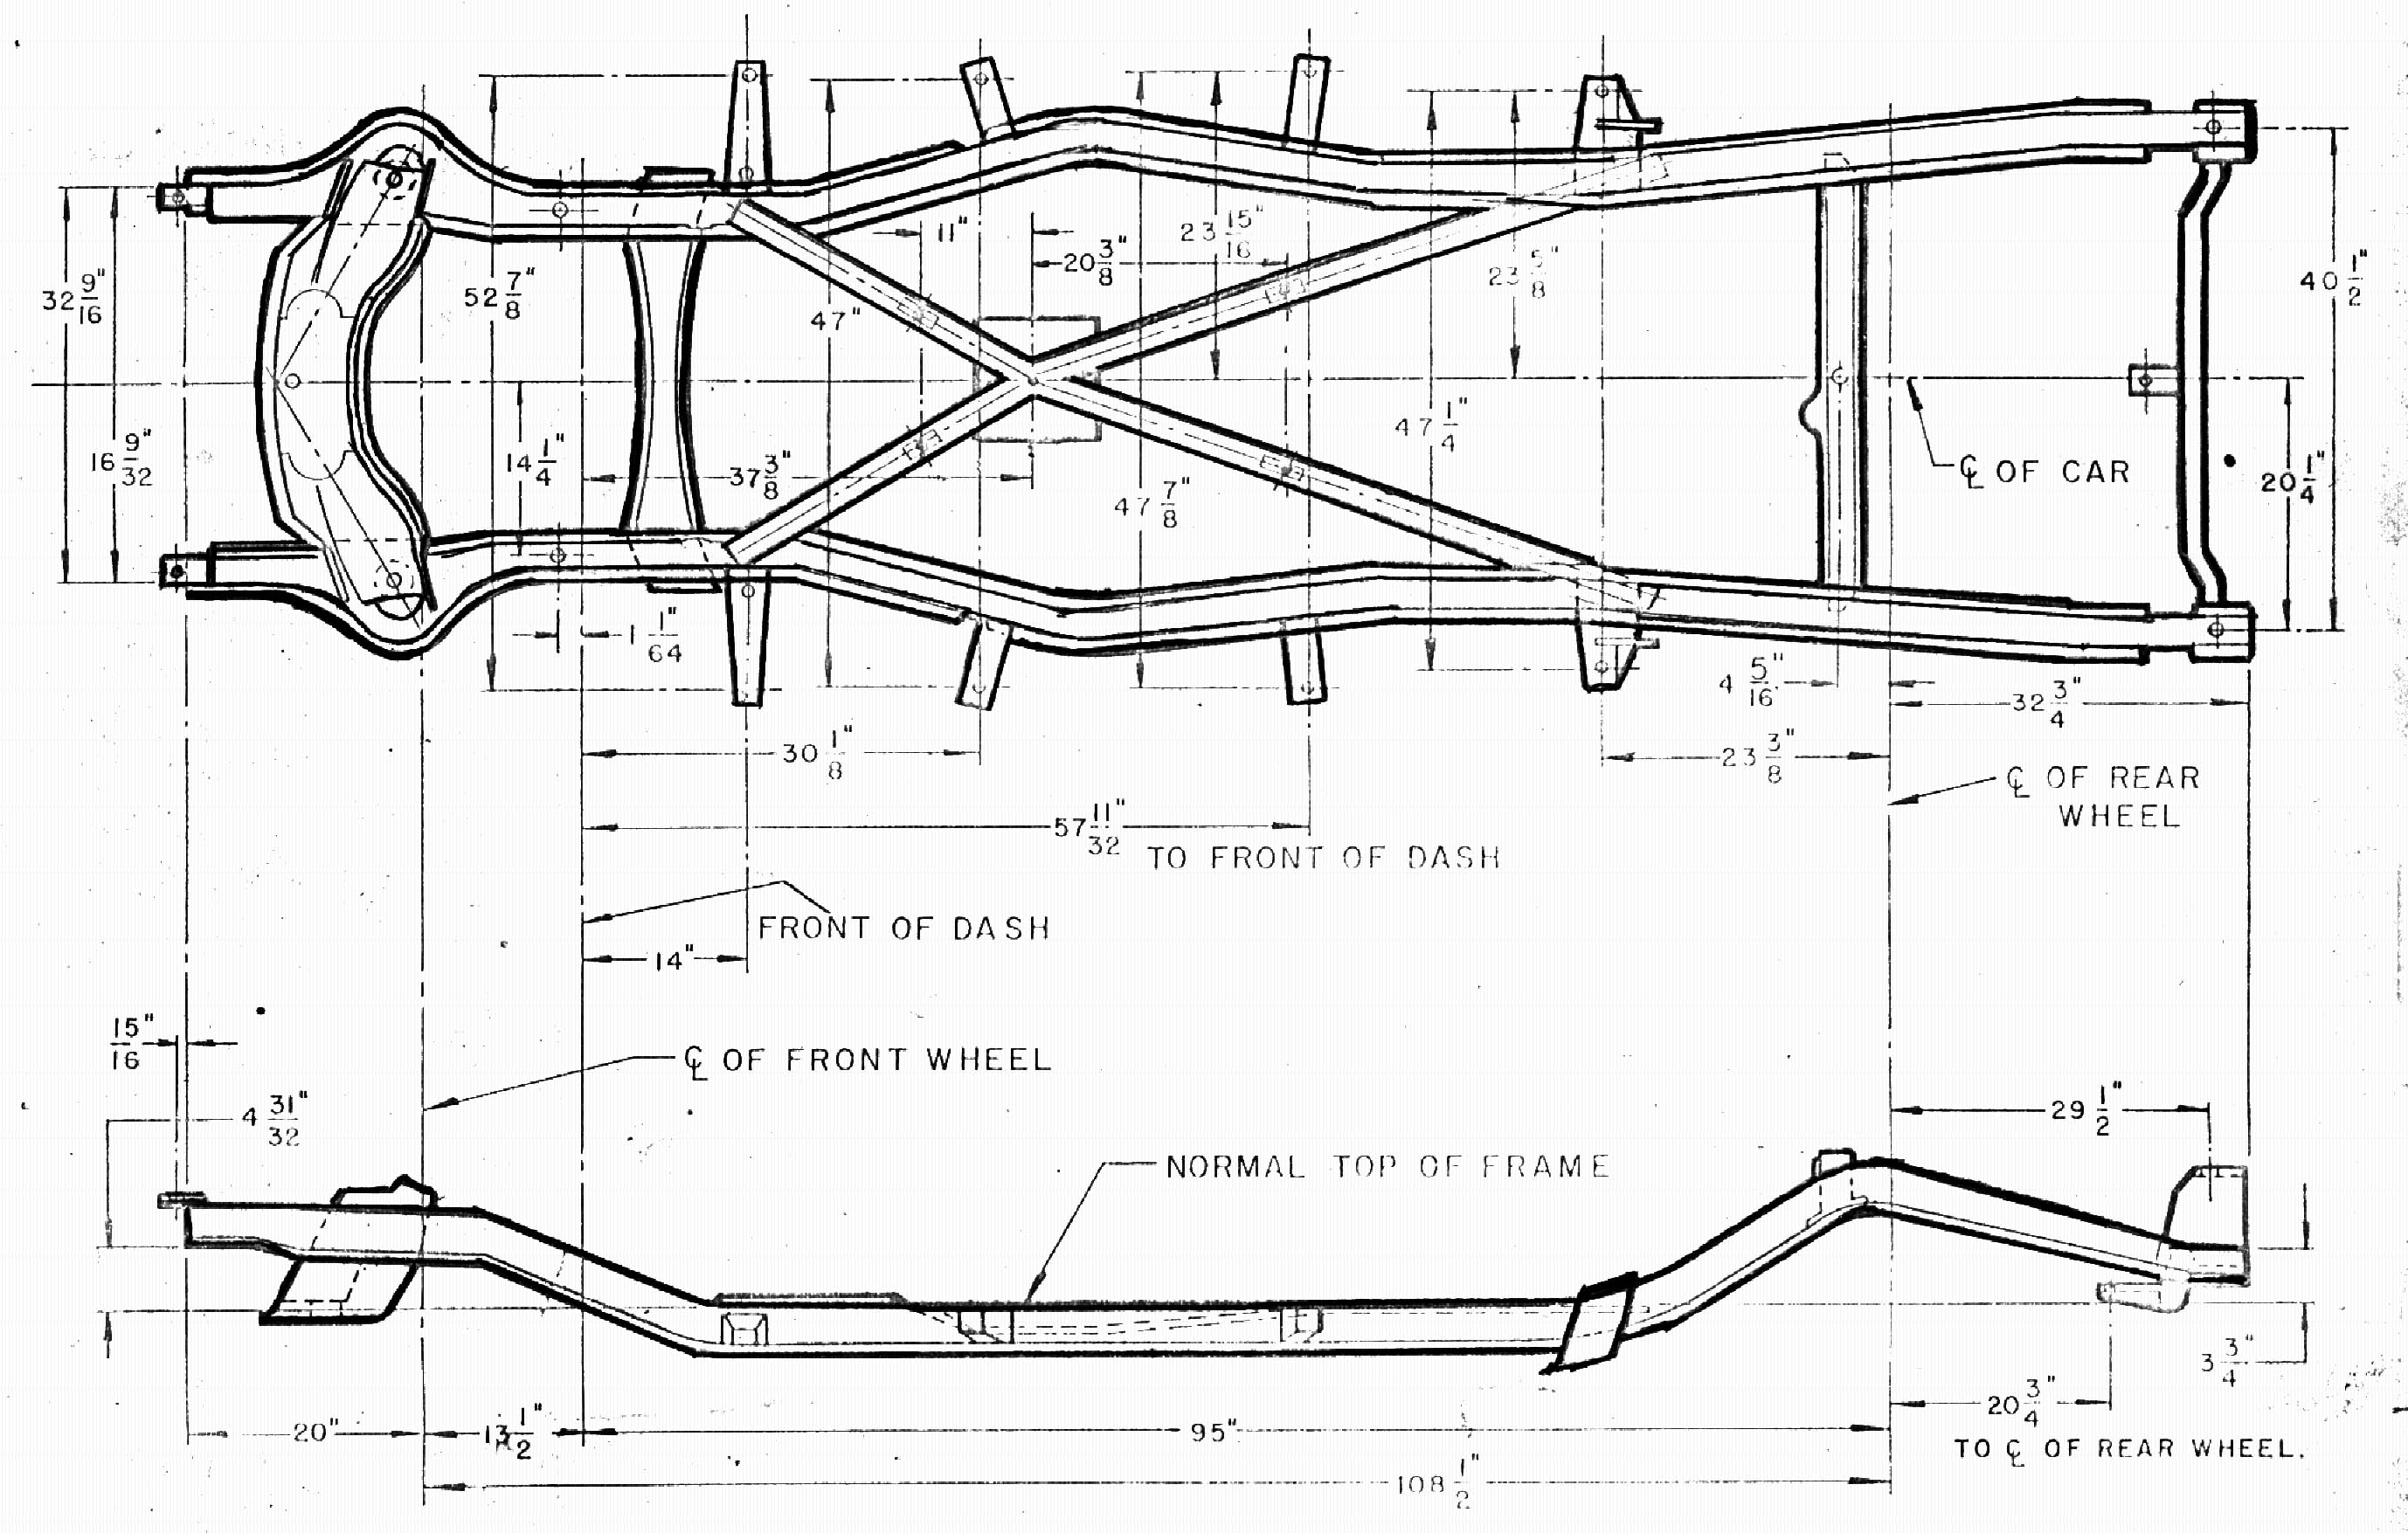 1964 studebaker wiring diagram